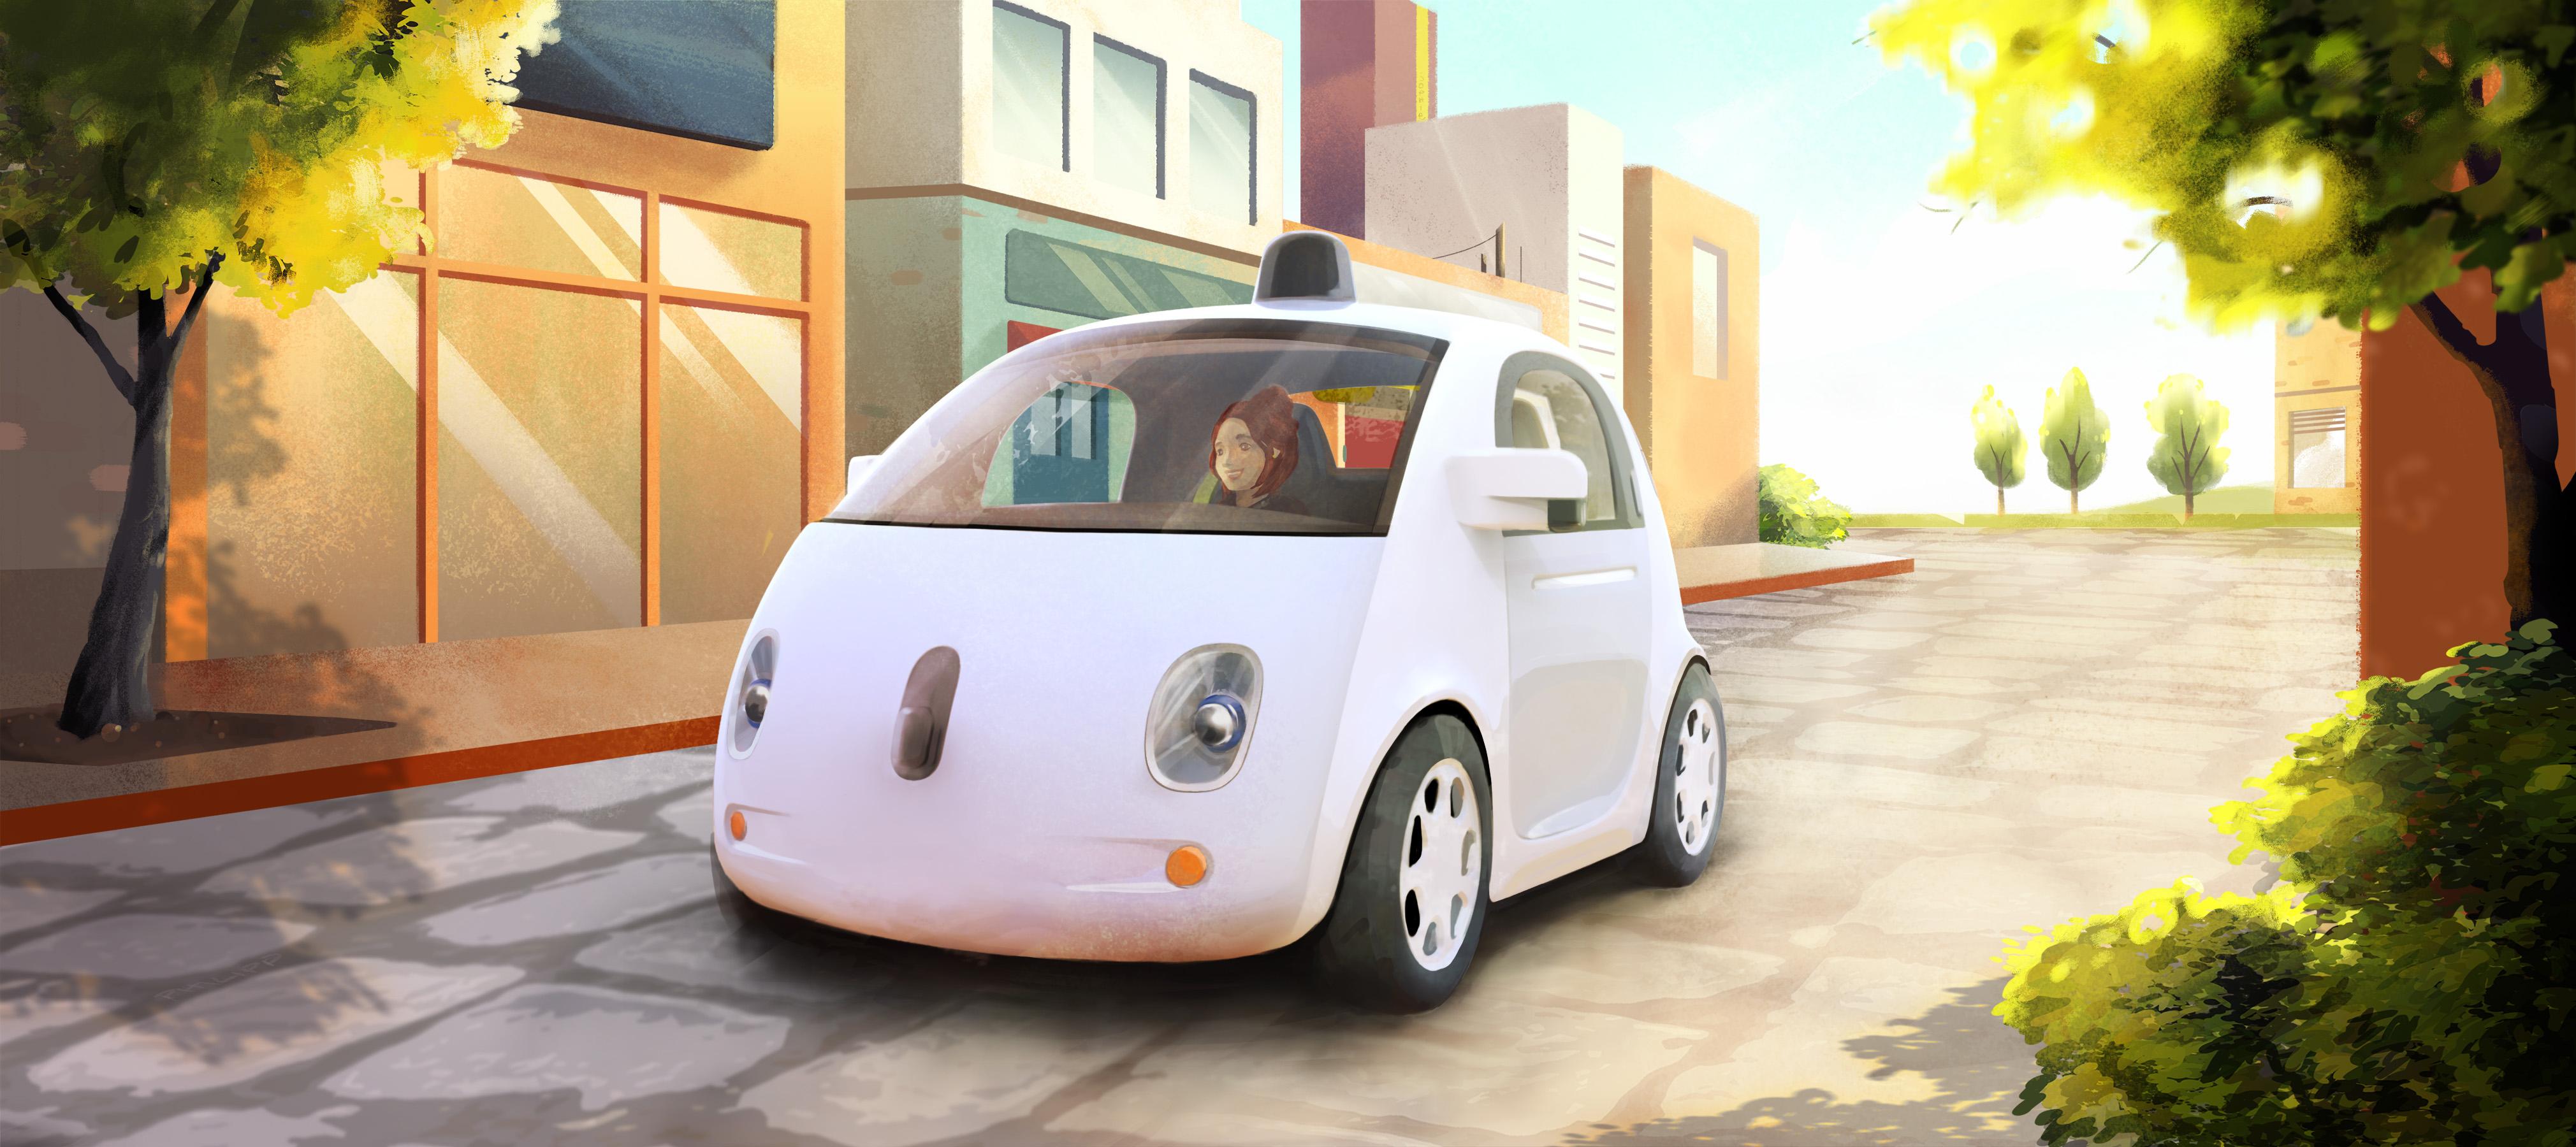 7 legal issue Self-Driving cars raise